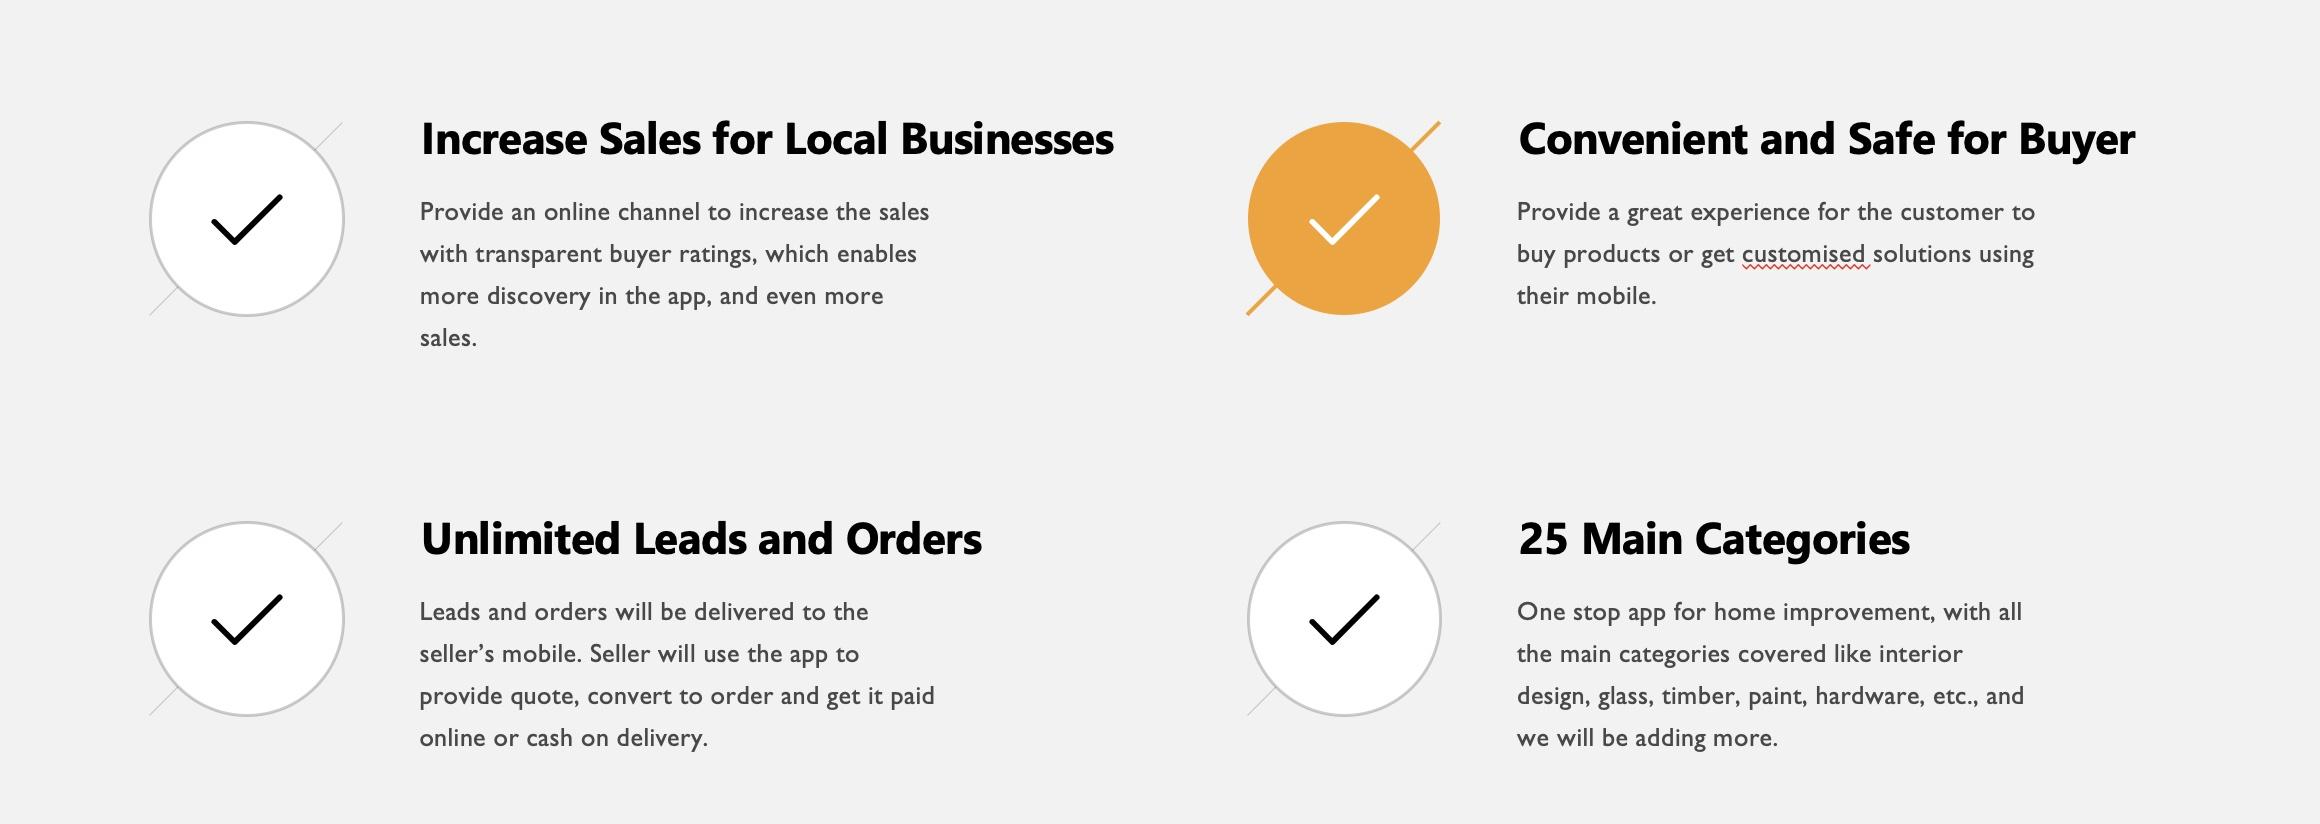 Benefits of Our Platform